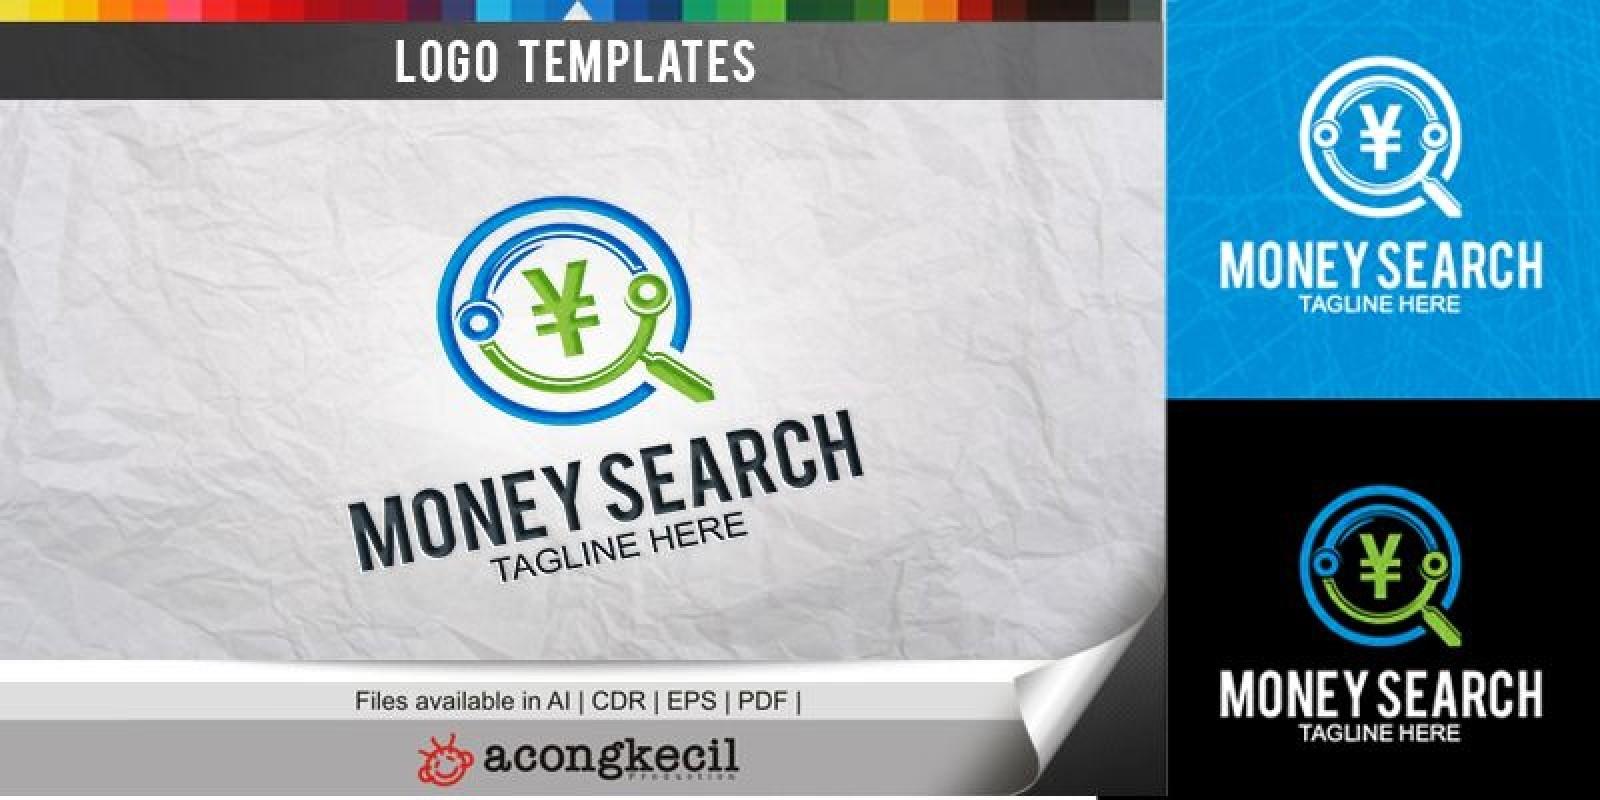 Money Search - Logo Template